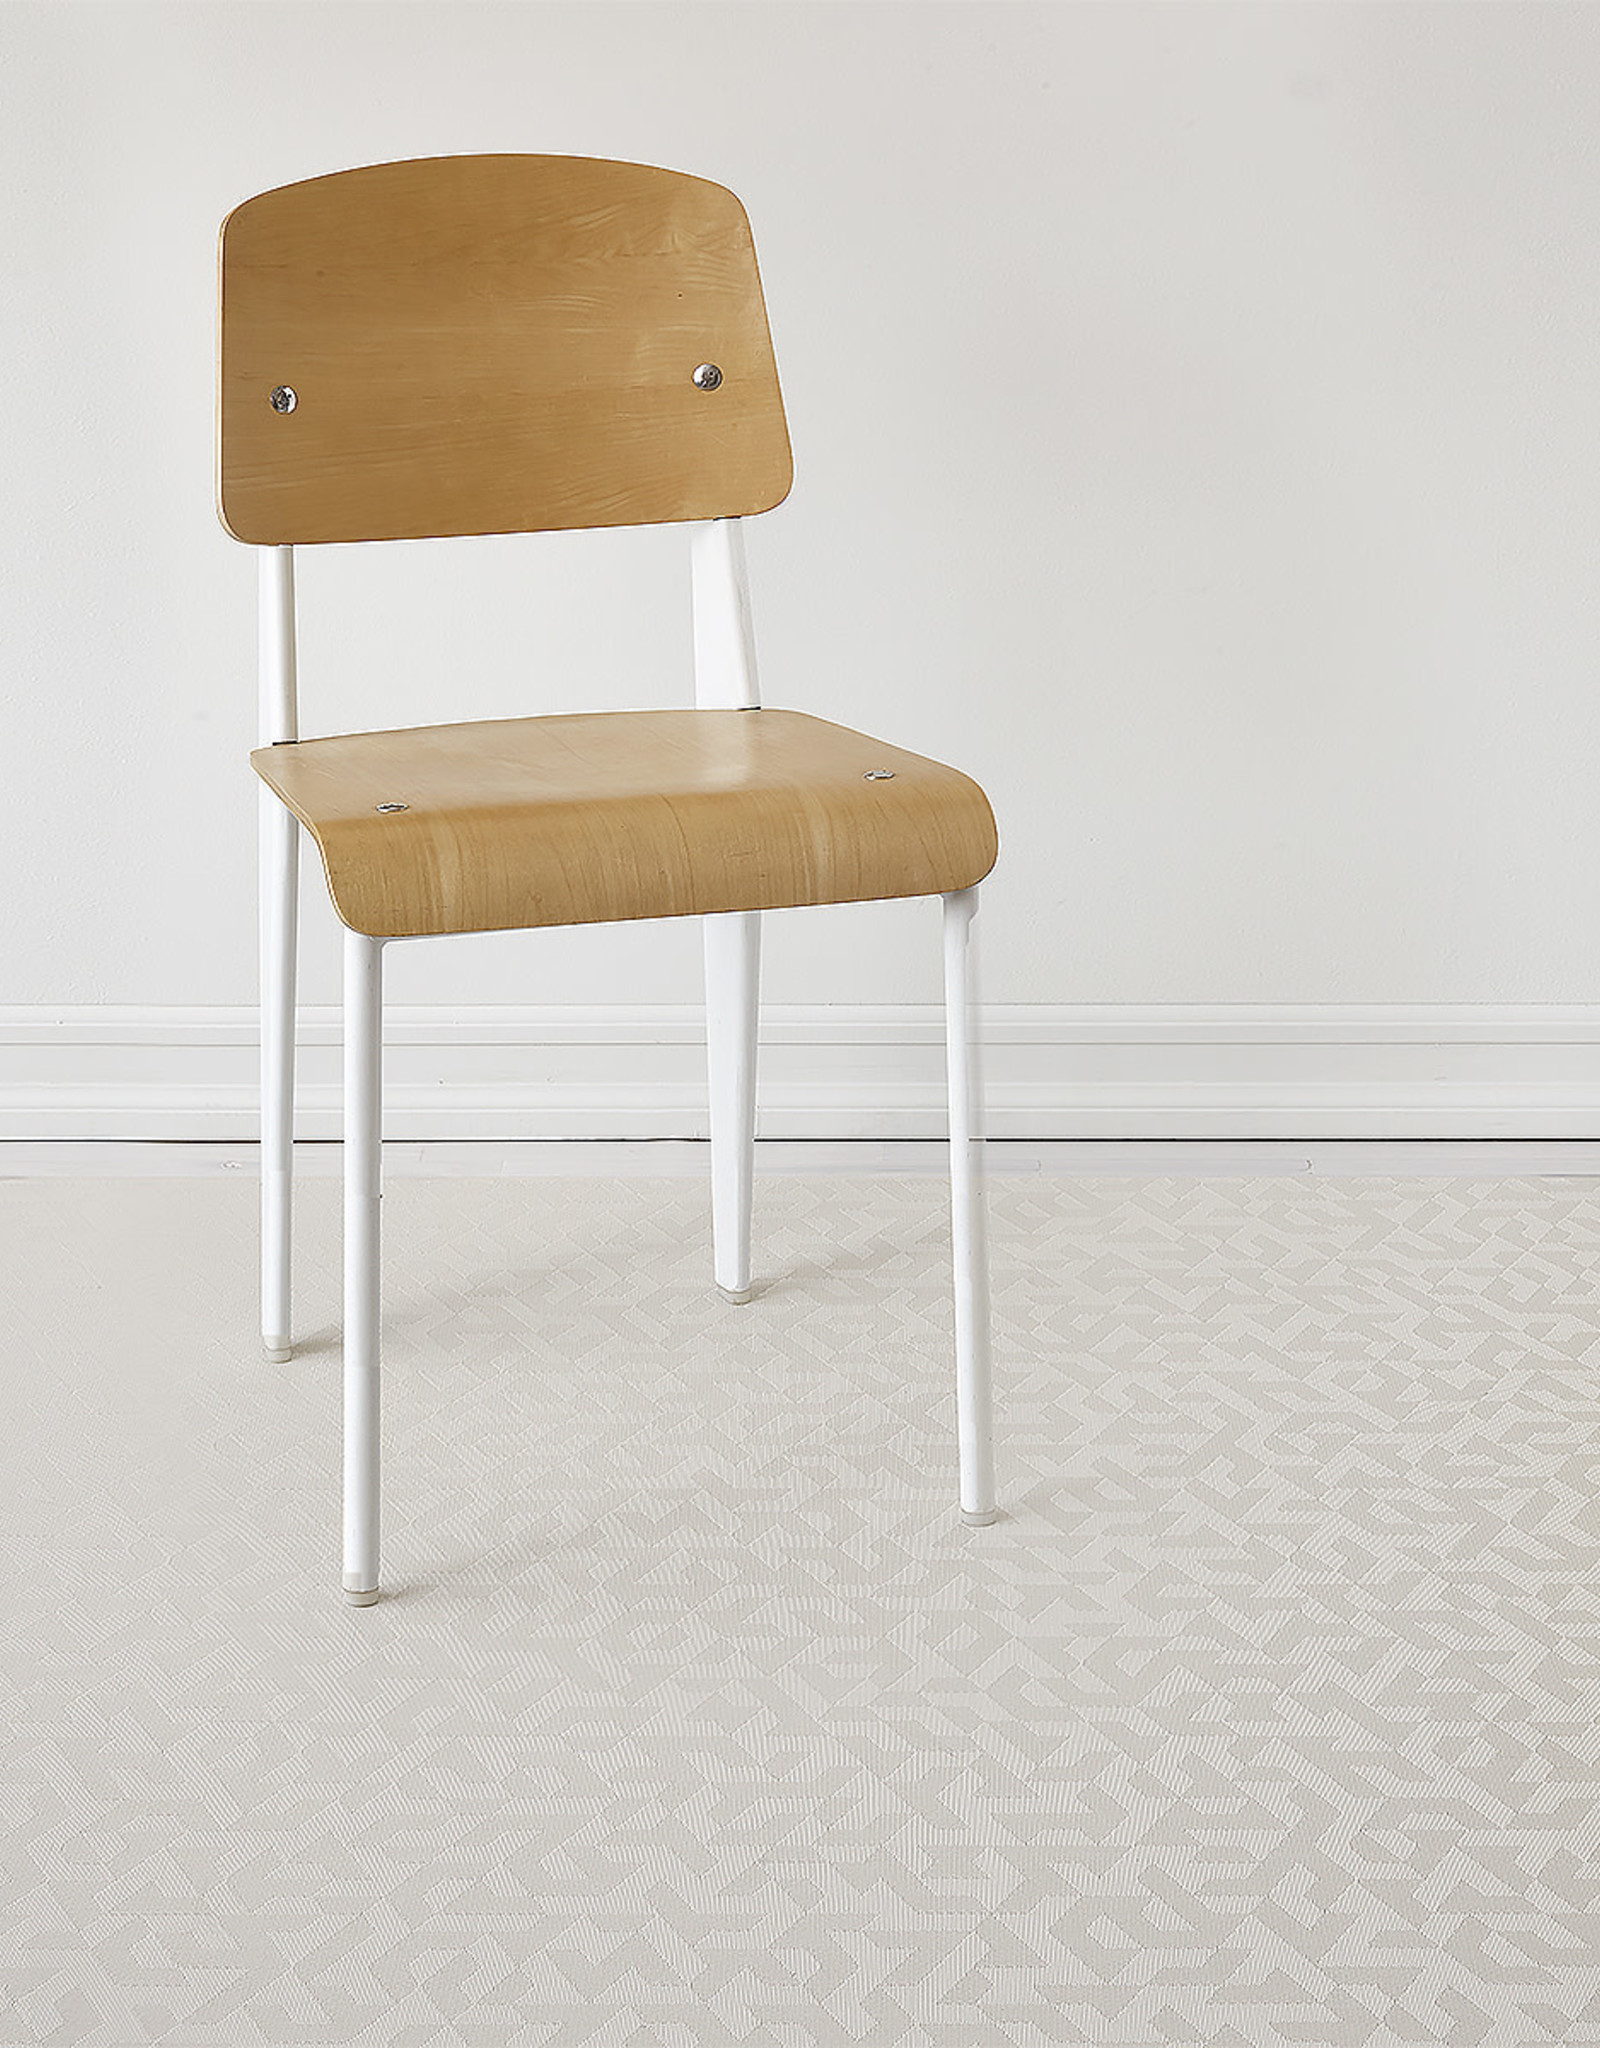 Chilewich Prism Floormat 46 x 72, NATURAL